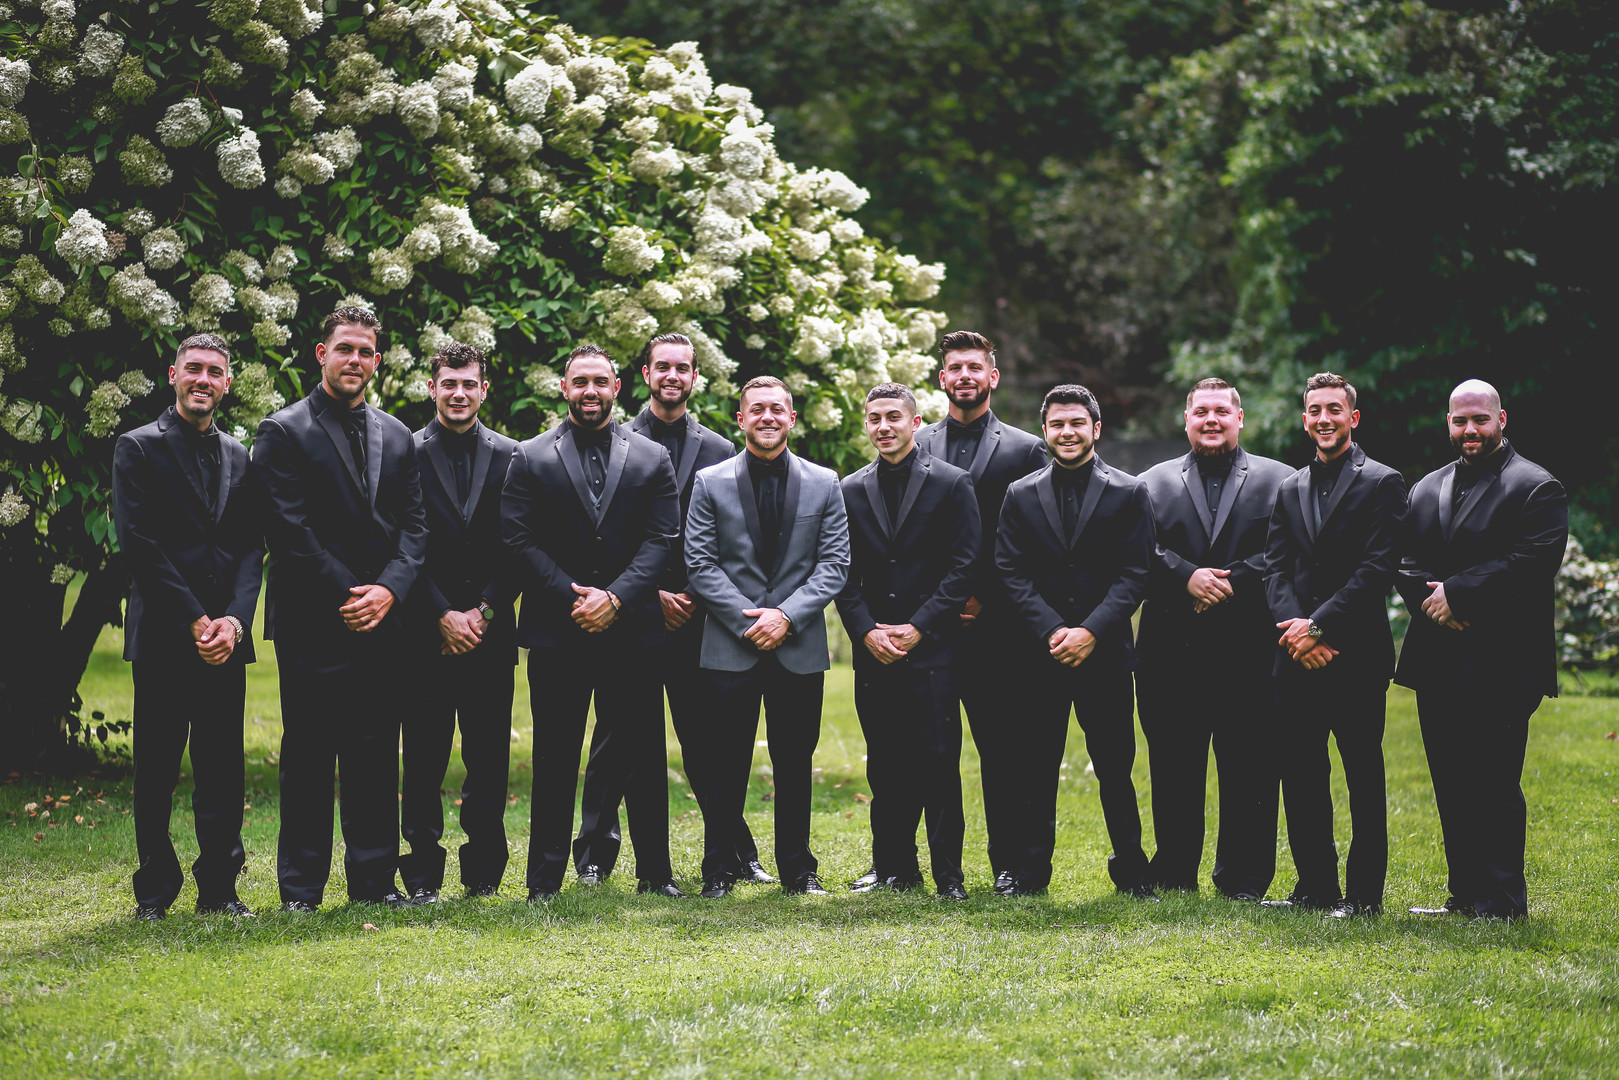 groomsmen-wedding-black-tux.jpg